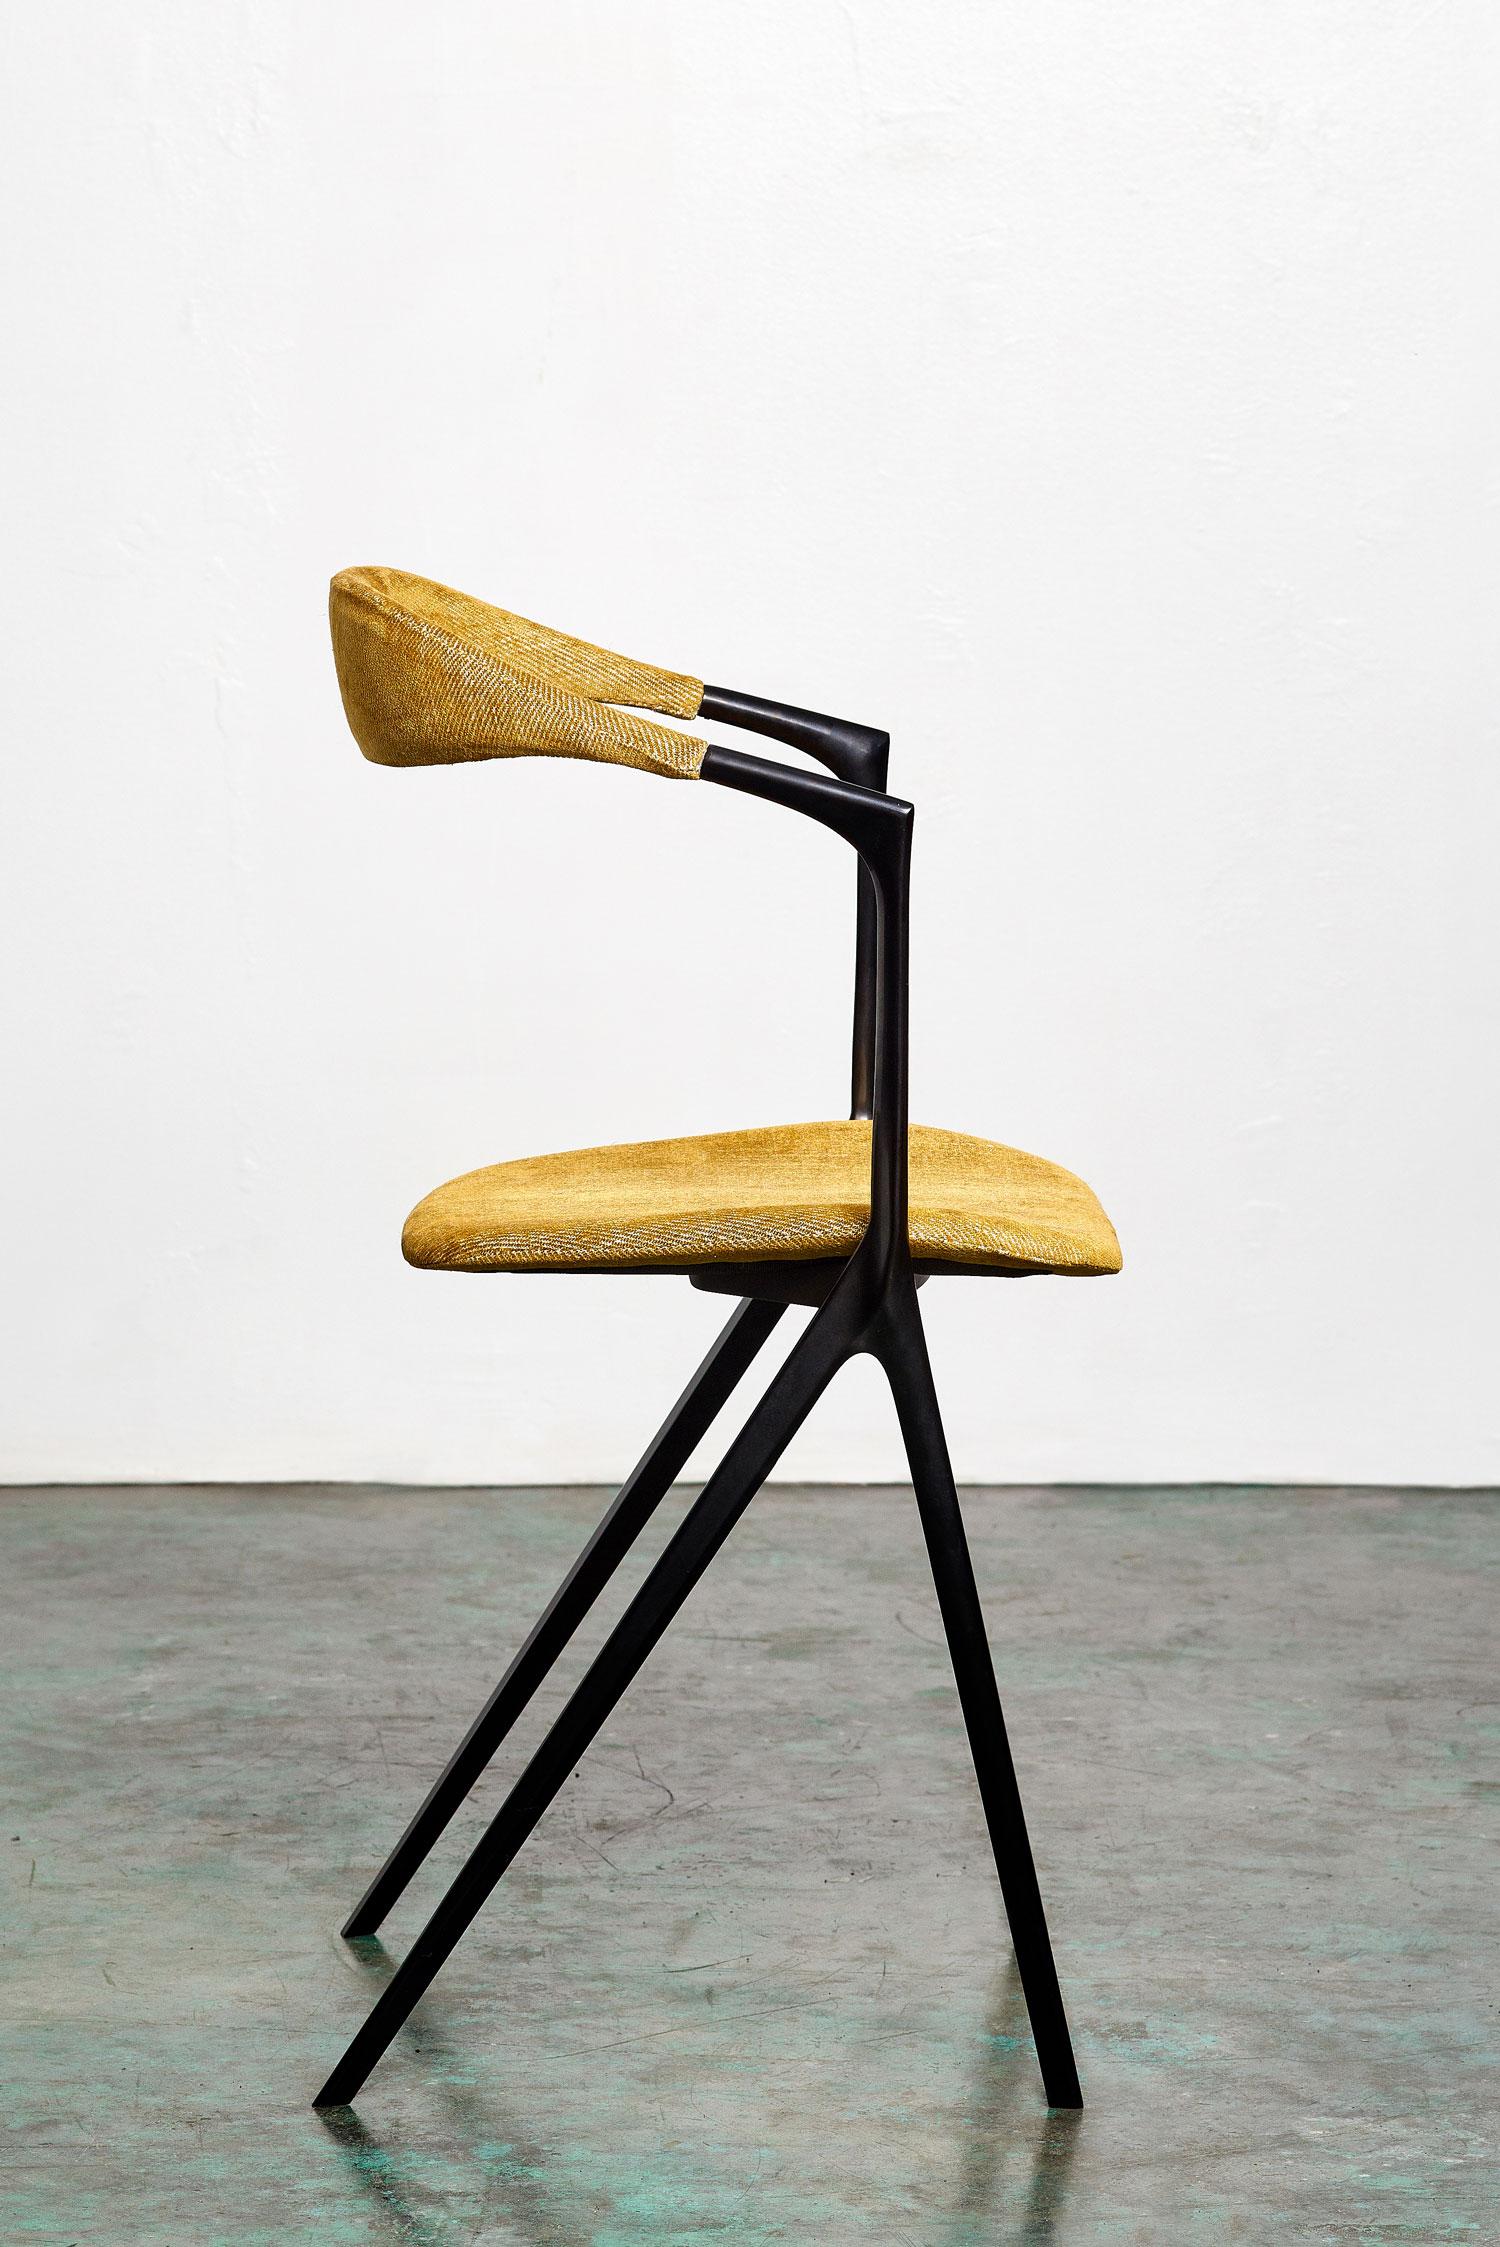 Local Design Charles Wilson, Australian Designers Milan | Yellowtrace